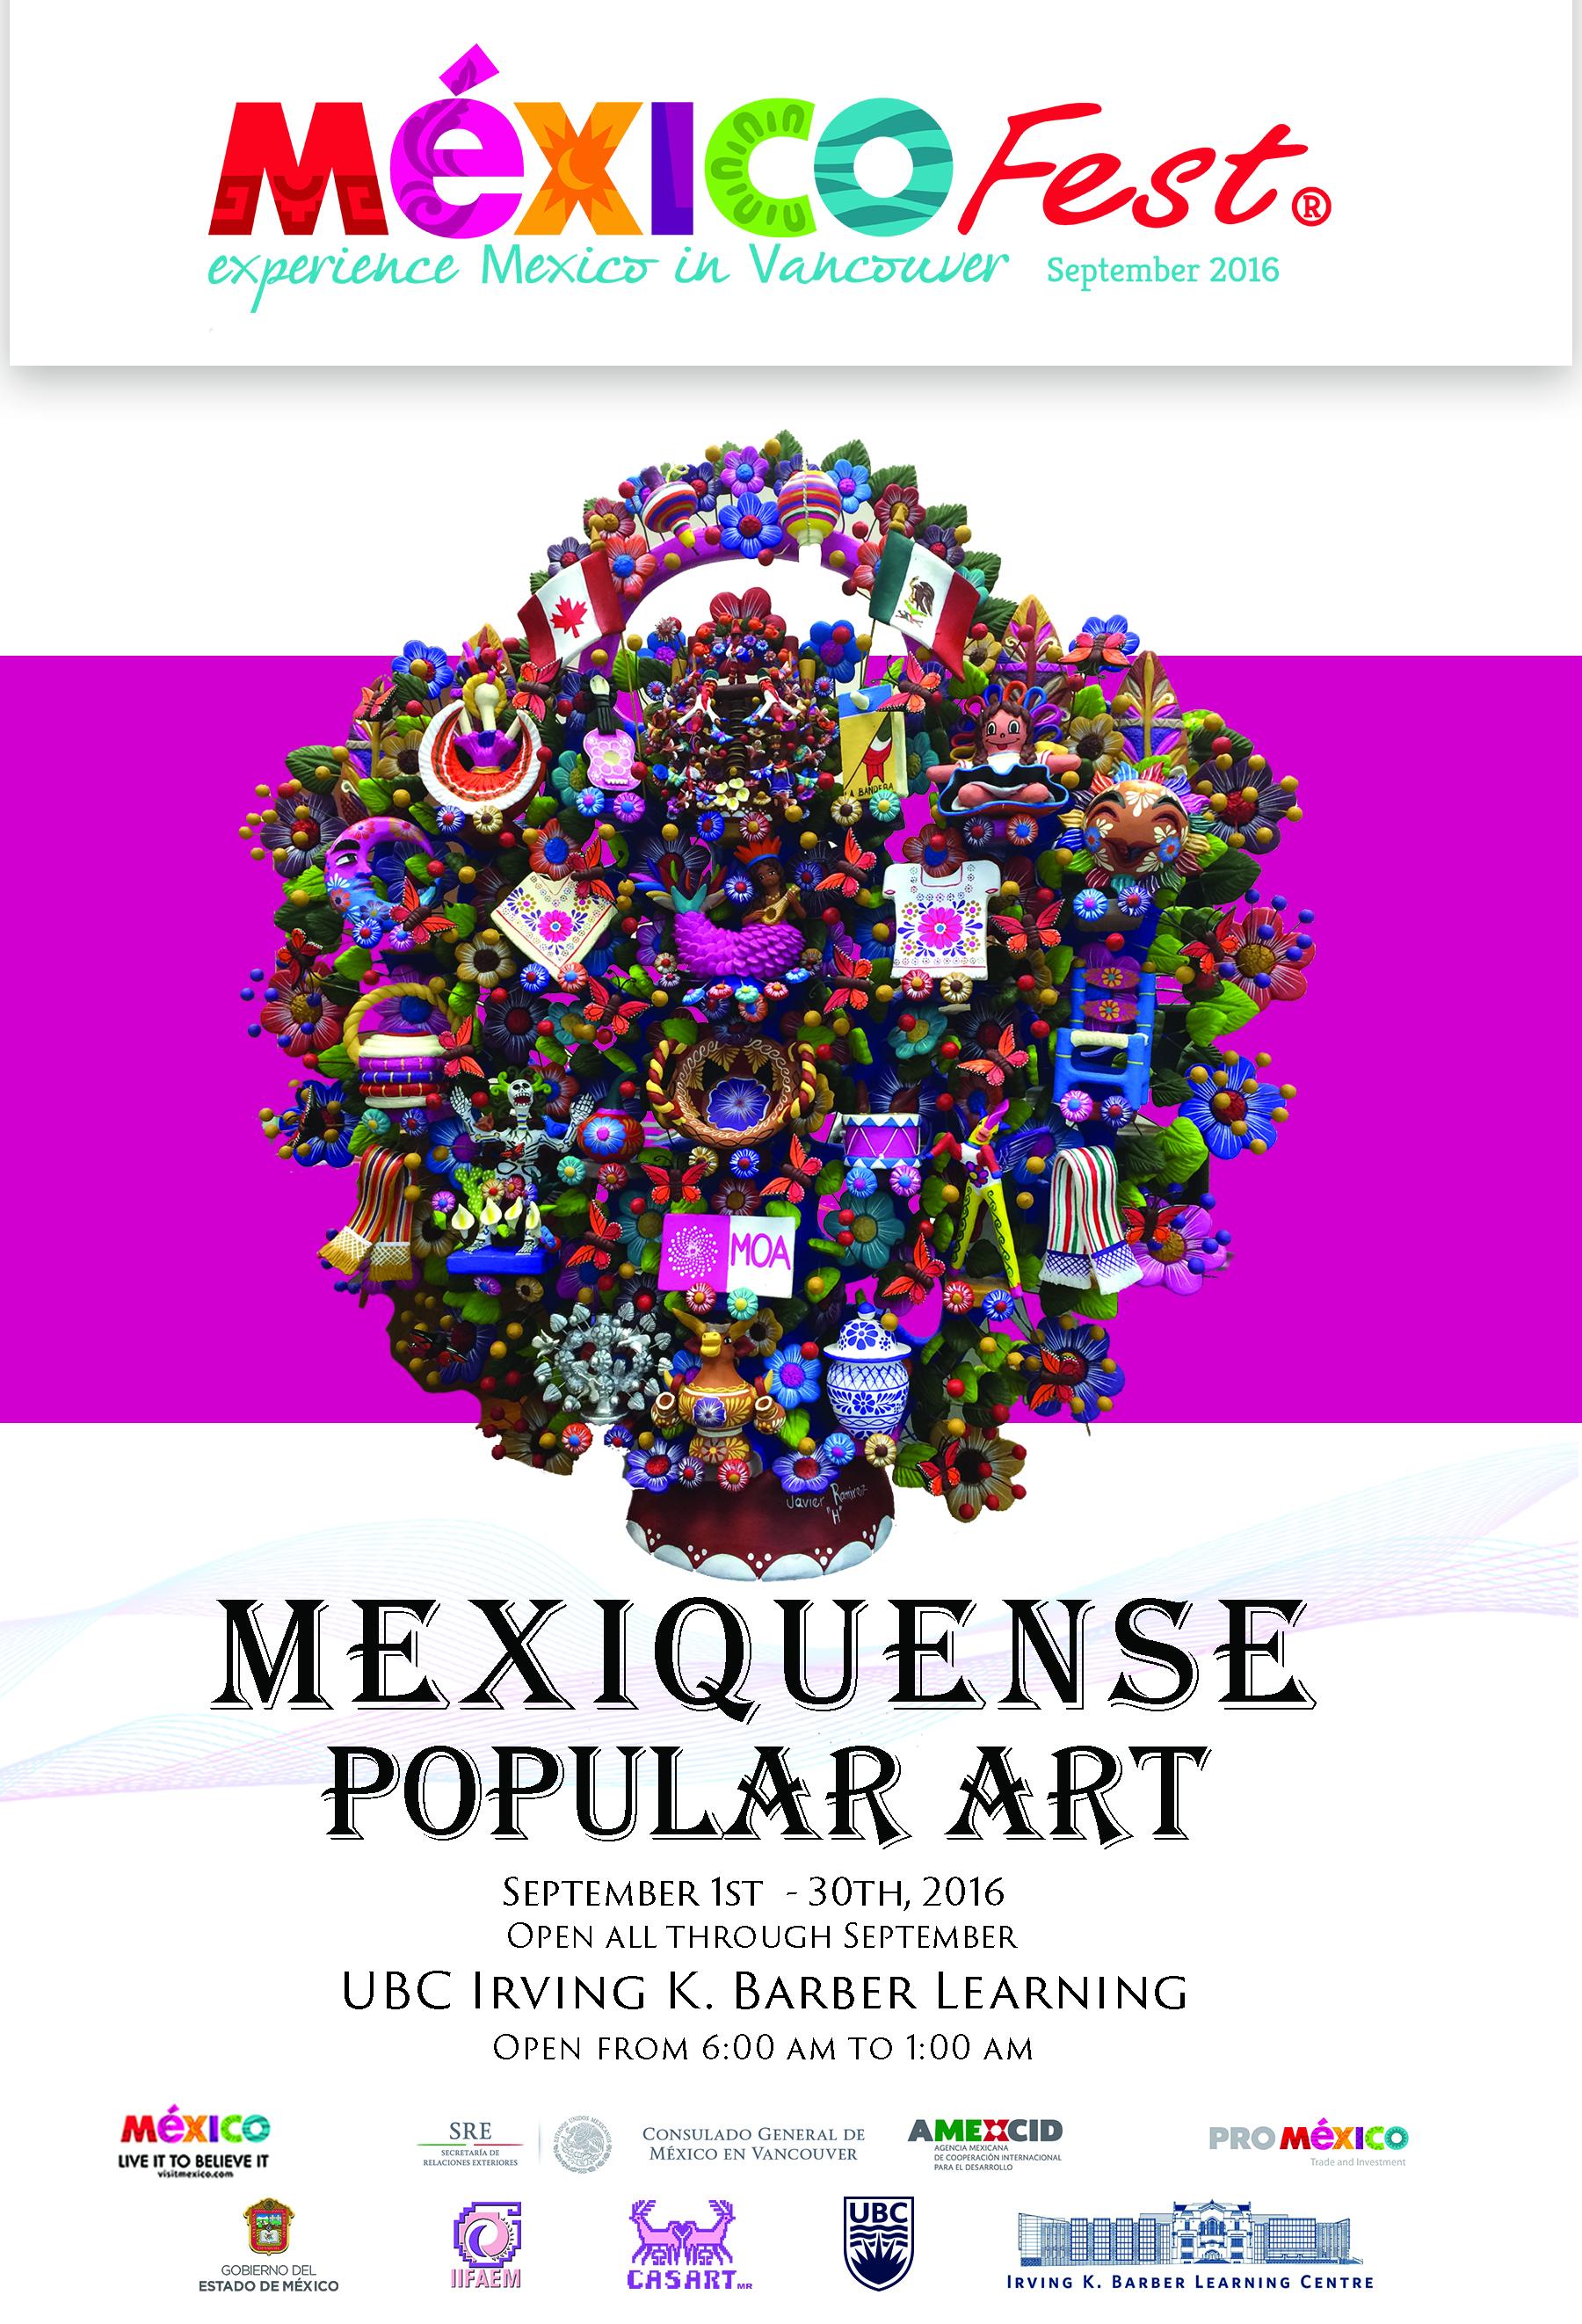 mexico fest imagen 1st draft